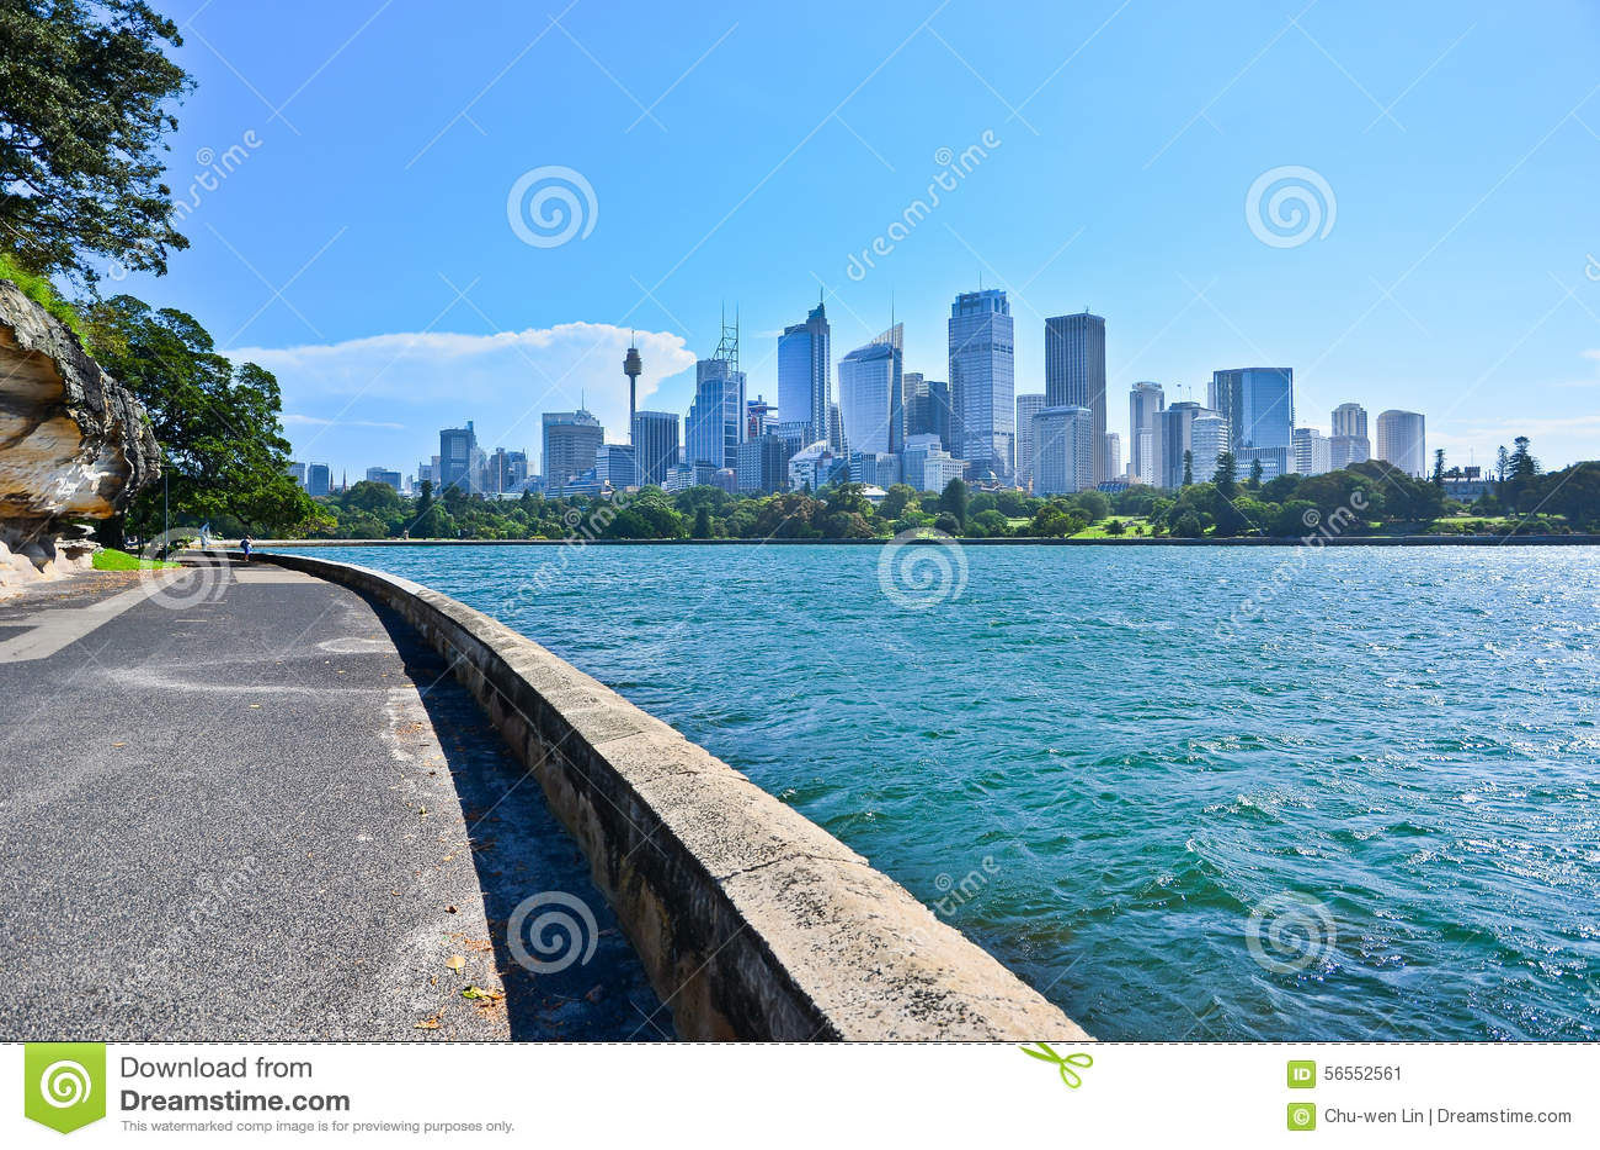 Download Άποψη του λιμανιού του Σίδνεϊ Στοκ Εικόνα - εικόνα από μητρόπολη, cityscape: 56552561